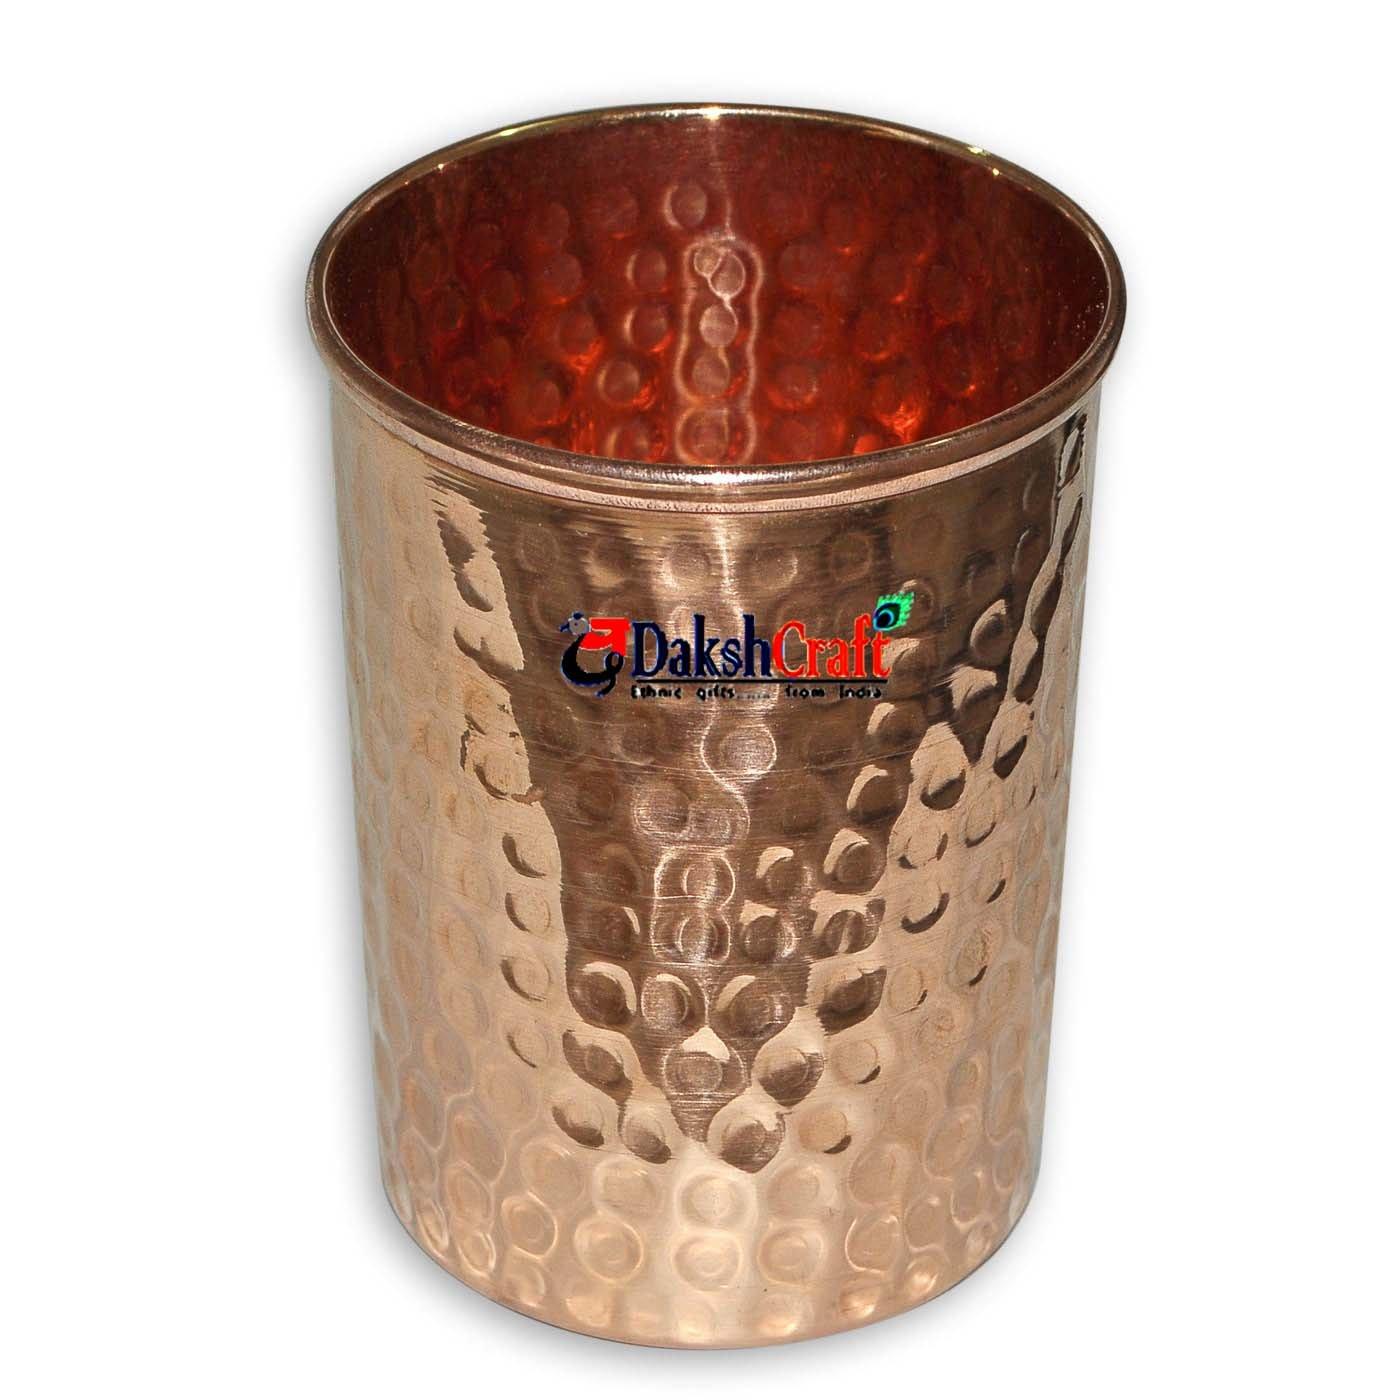 Dakshcraft Handmade Pure Copper Hammered Tumbler